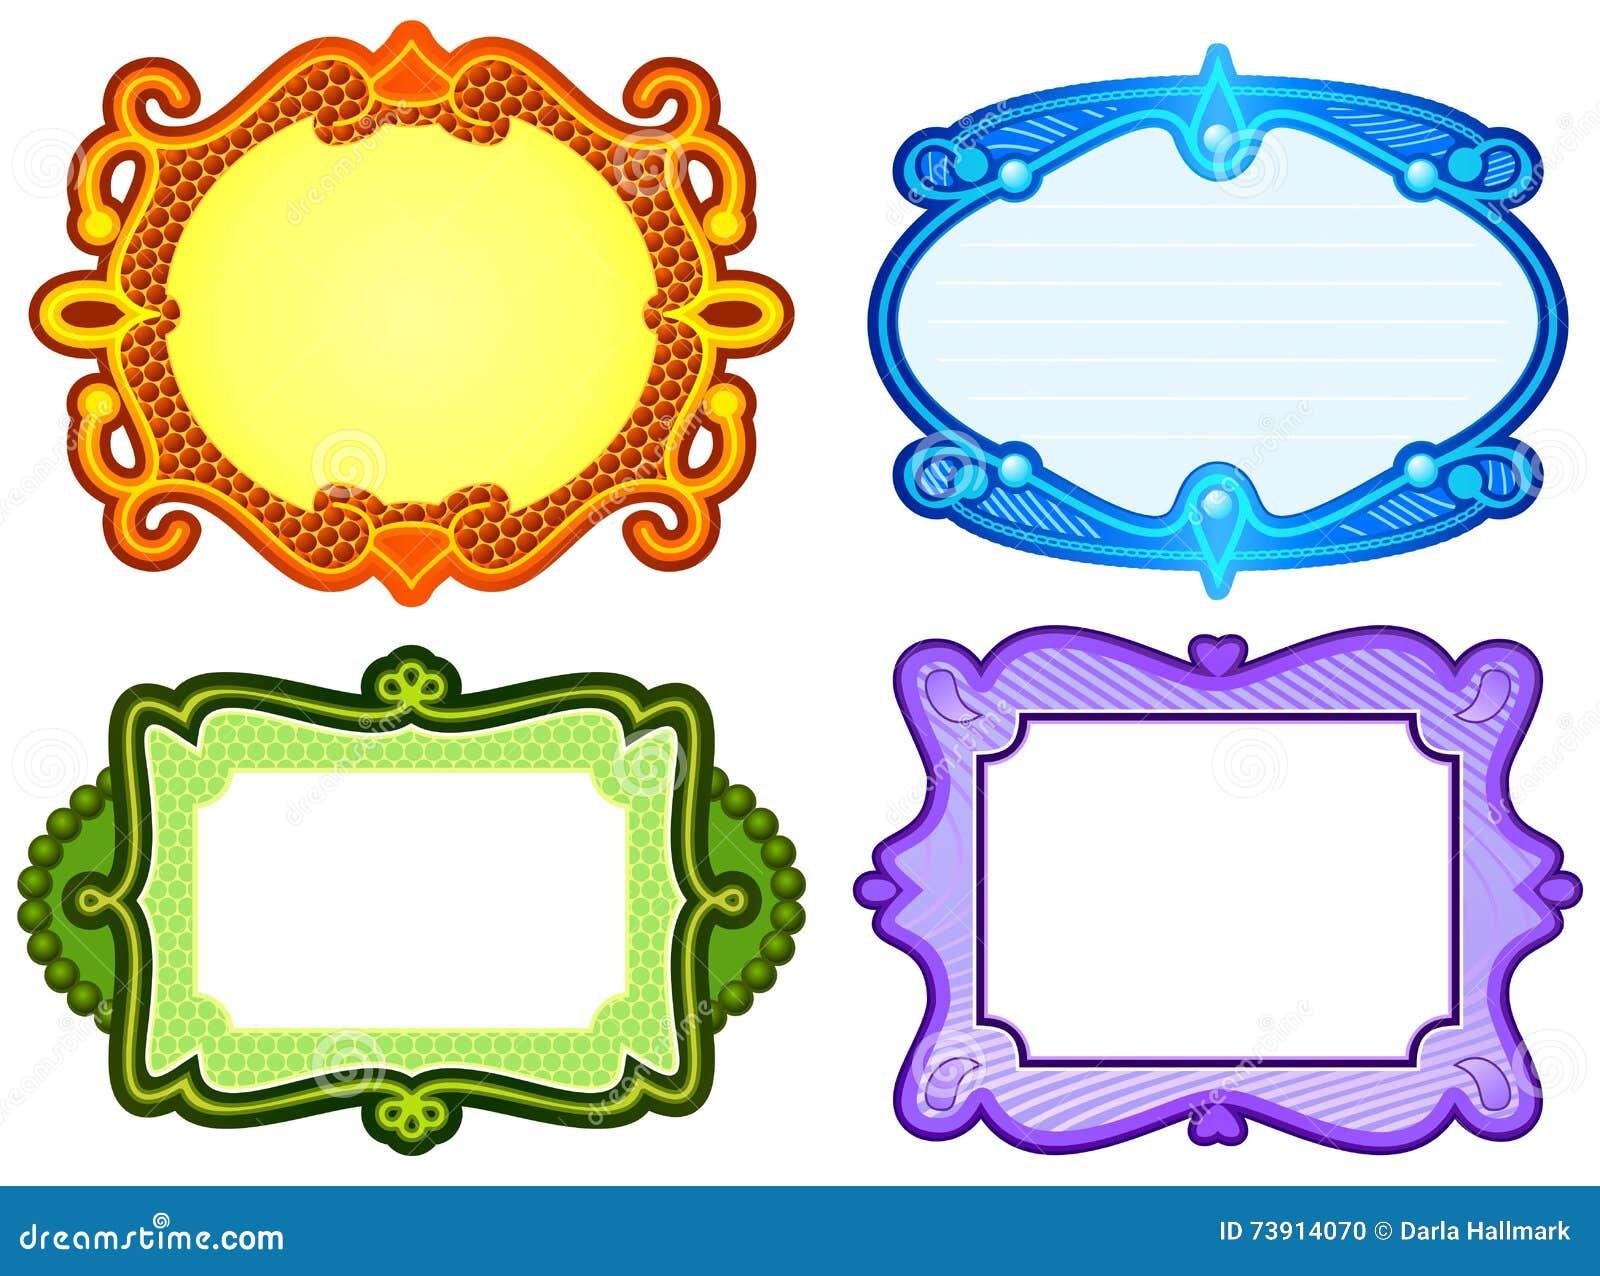 Ornate frame designs stock vector. Illustration of colorful - 73914070